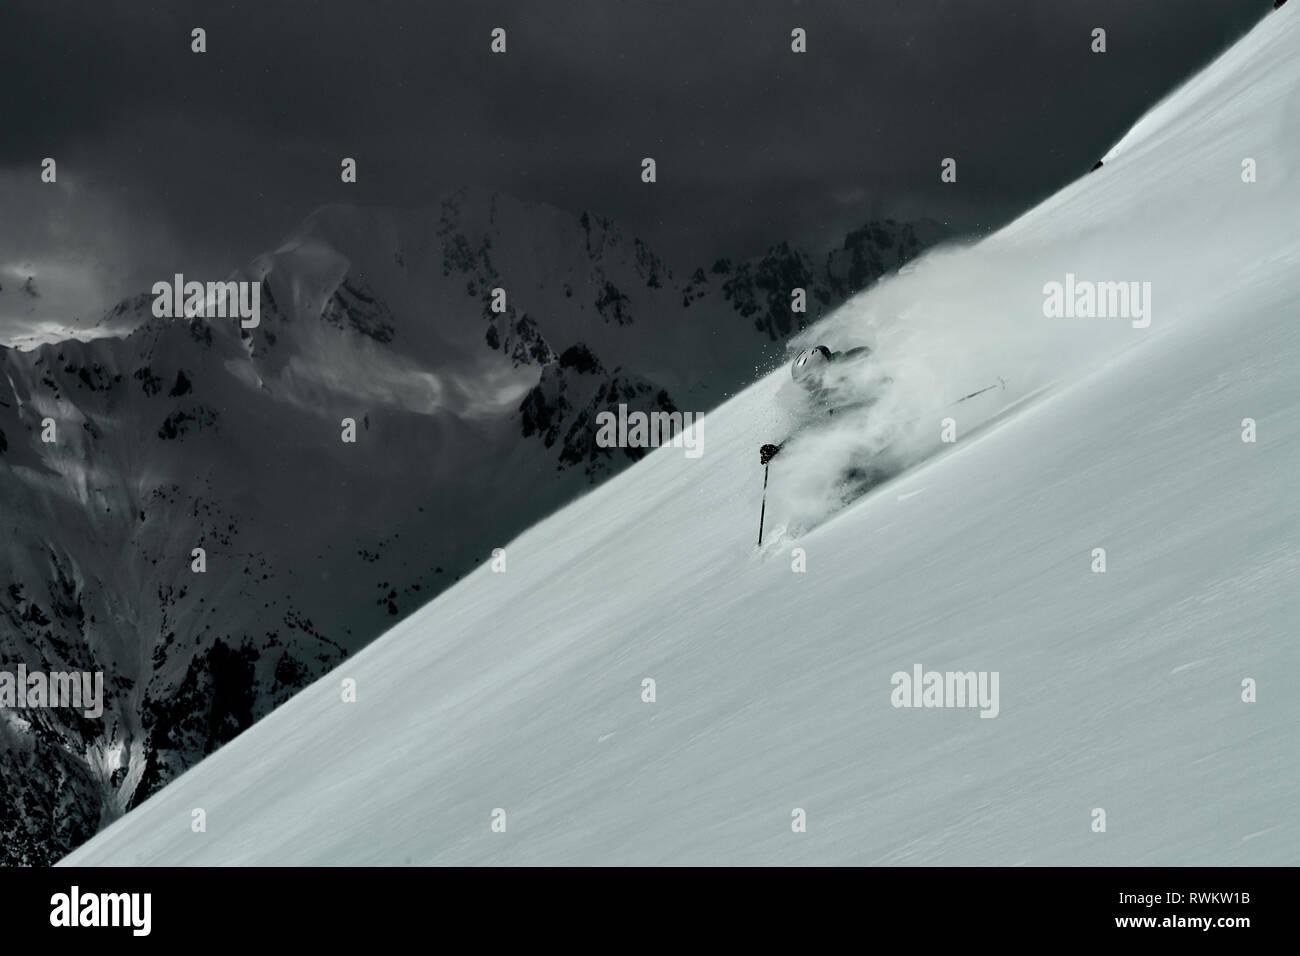 Male skier speeding down steep mountainside, Alpe-d'Huez, Rhone-Alpes, France - Stock Image